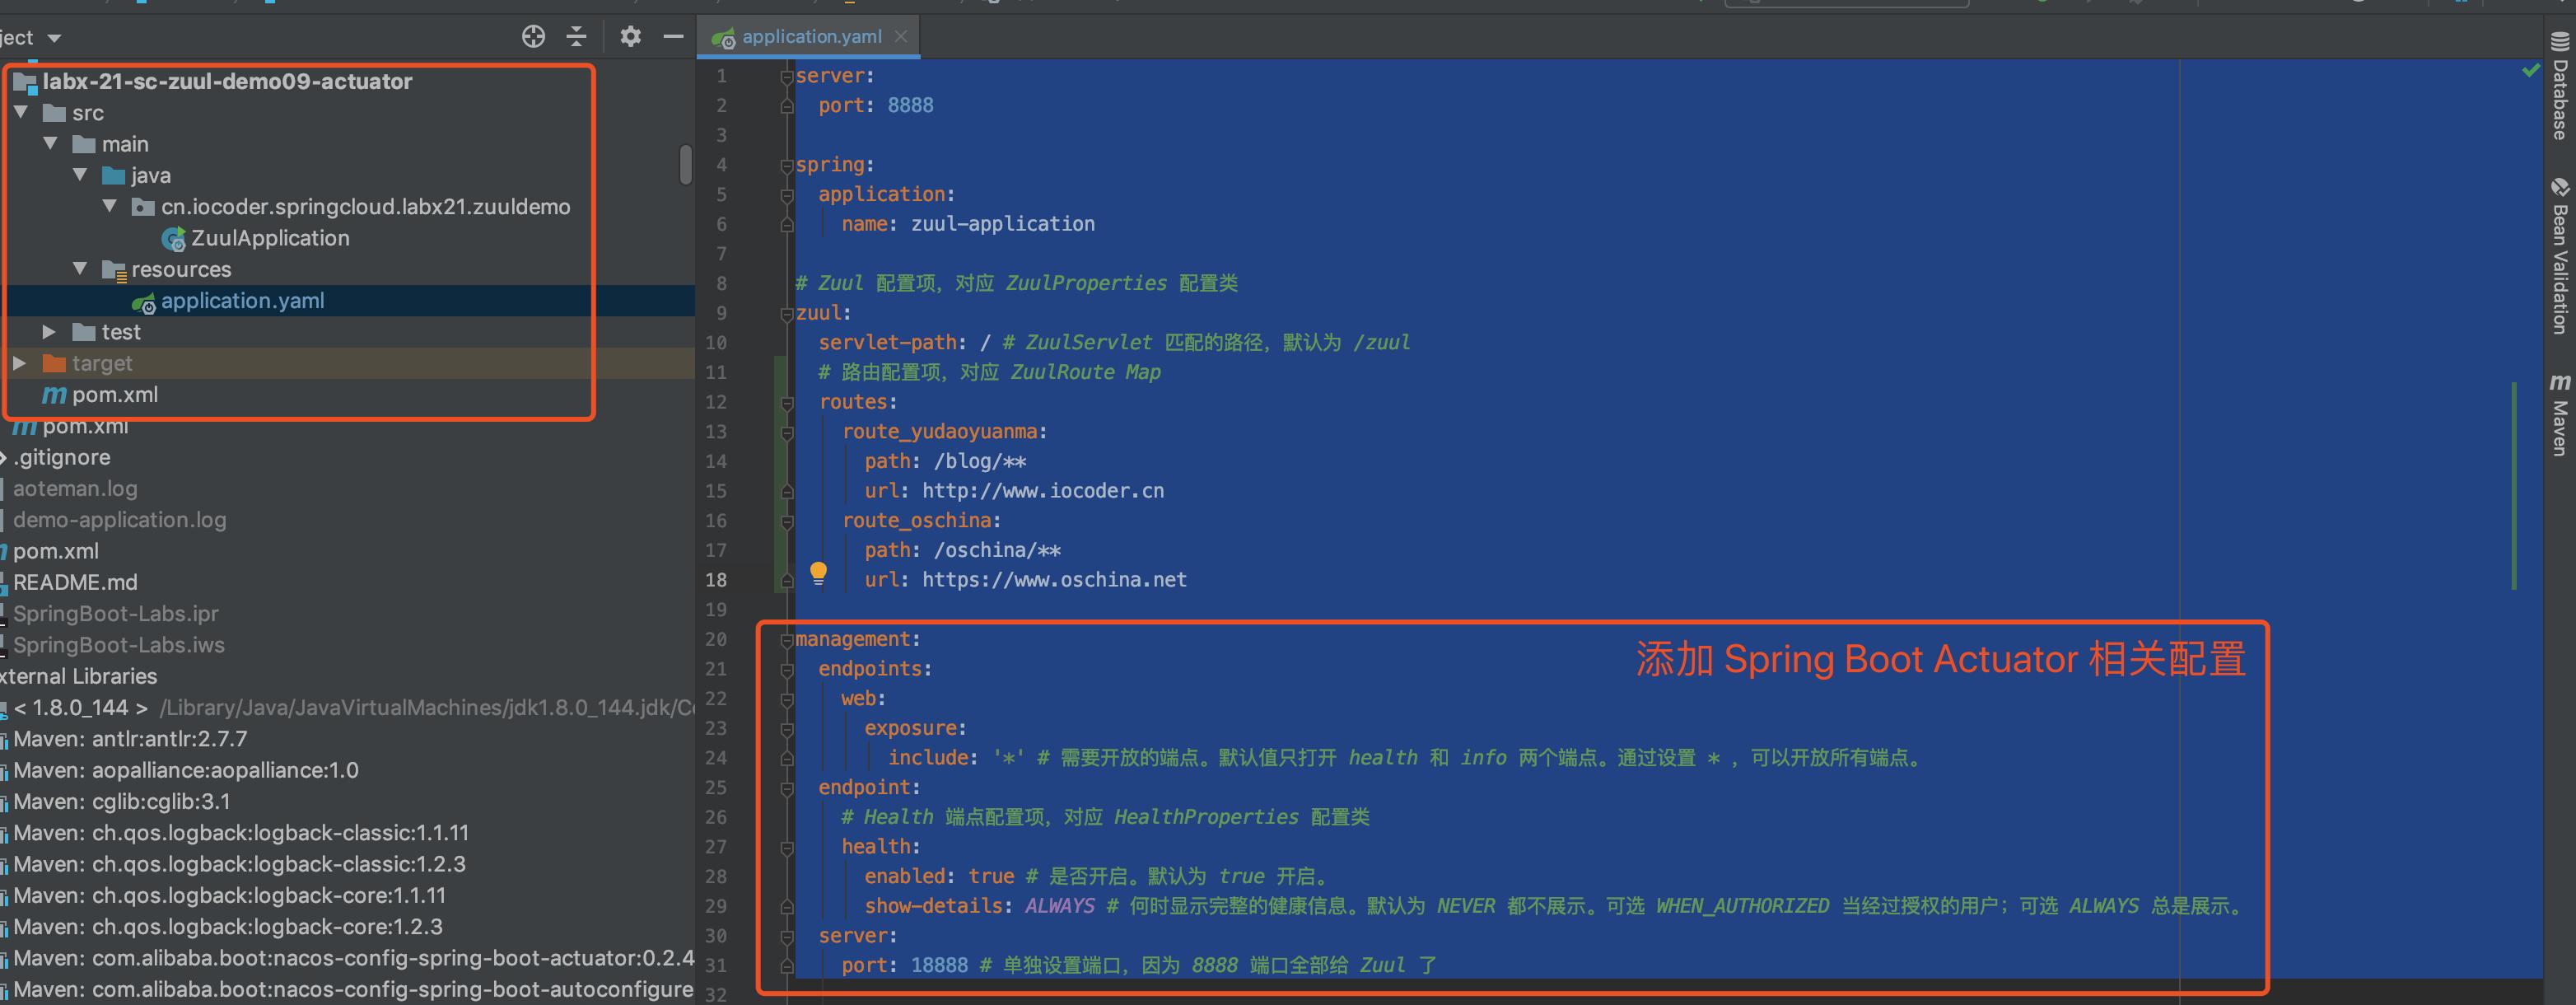 `labx-08-sc-gateway-demo09-actuator` 项目